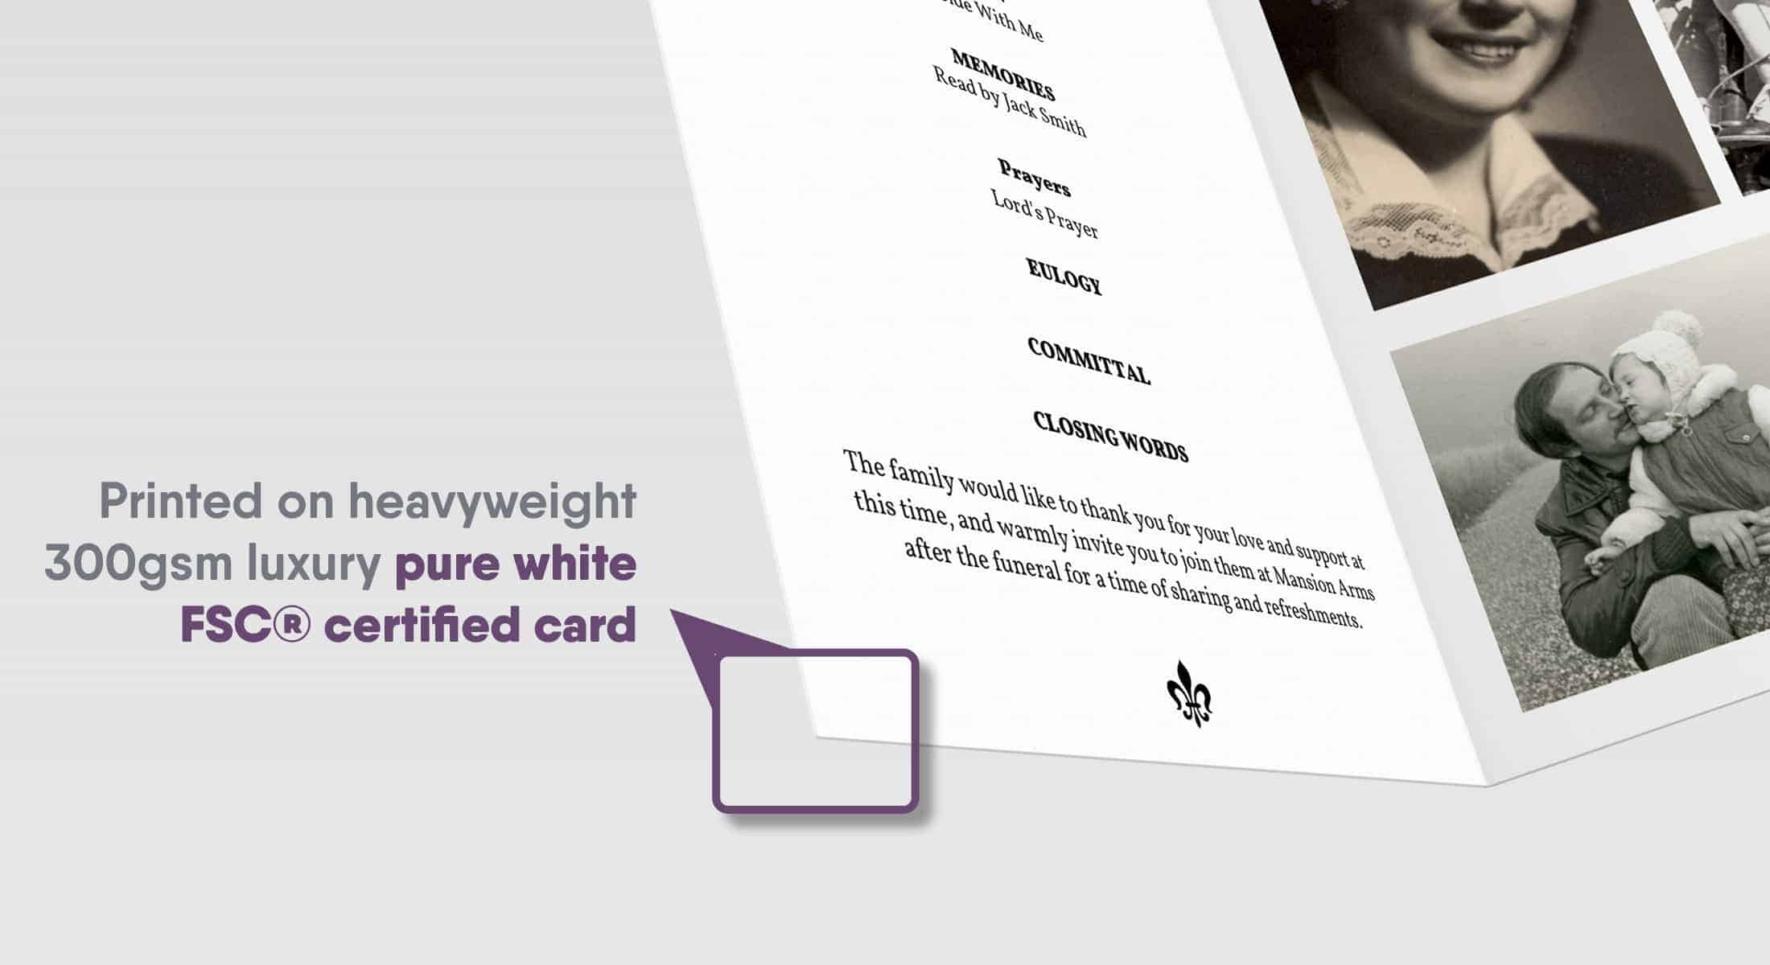 Luxury Heavyweight Card